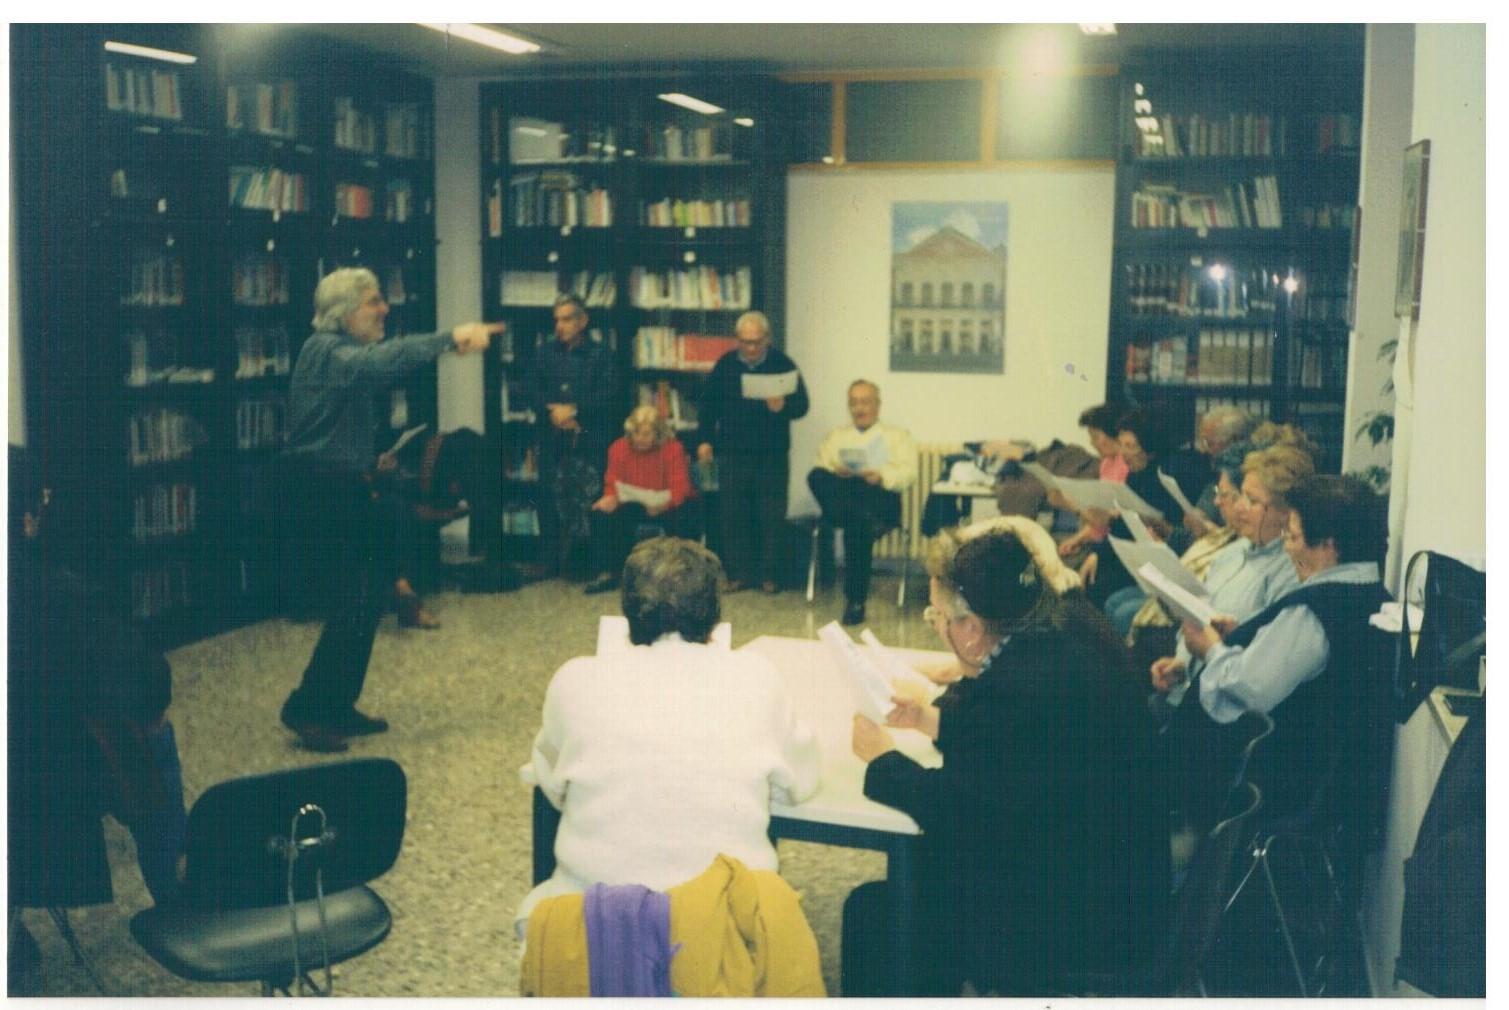 Bari. Centro Sociale Educativo. Japigia-Torre a mare. 2002